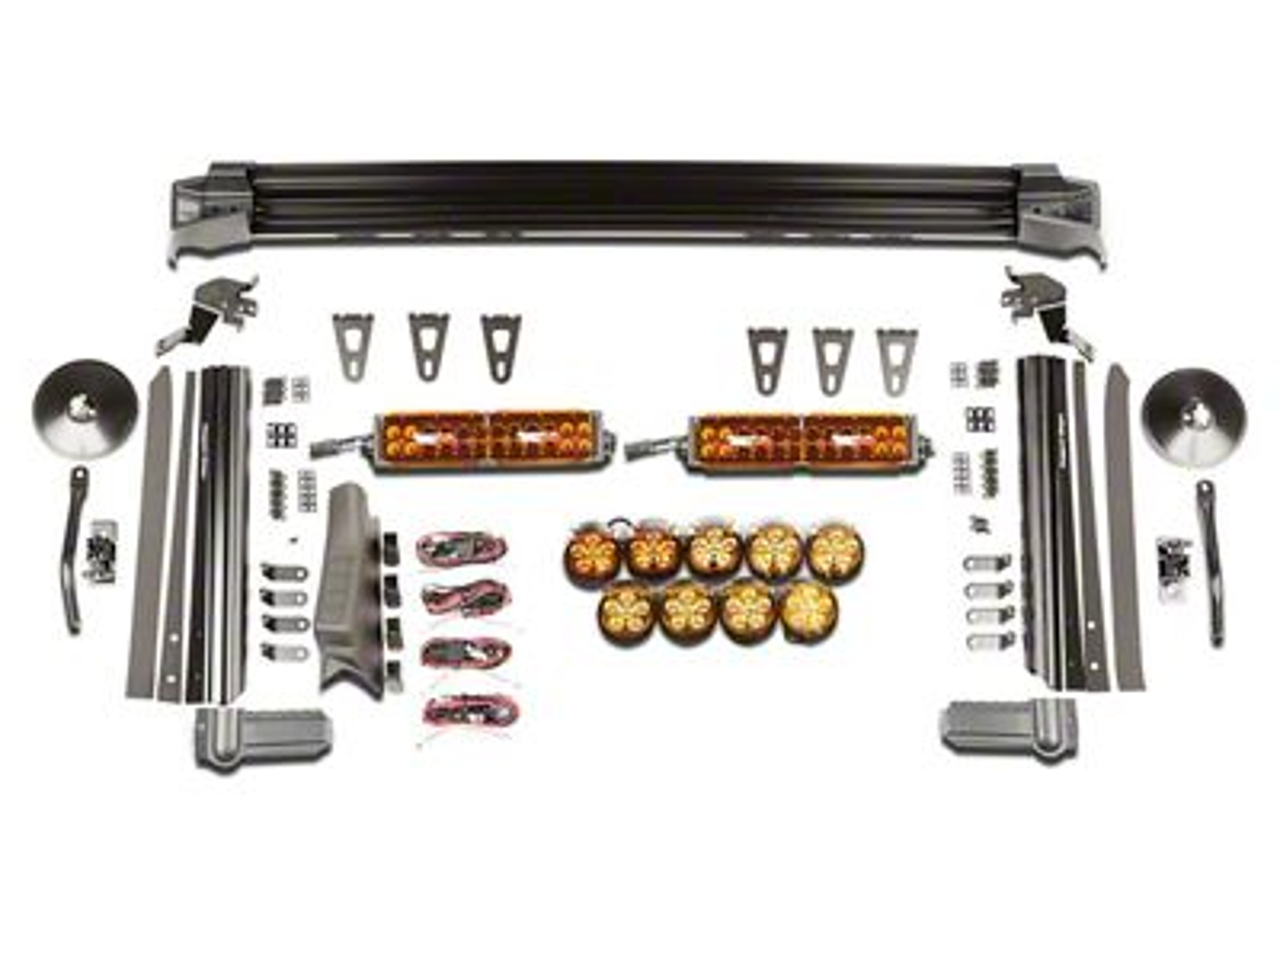 Rugged Ridge Elite Fast Track Windshield Light Bar w/ Two 13 in. LED Light Bars & 9 Round LED Lights (07-18 Jeep Wrangler JK)